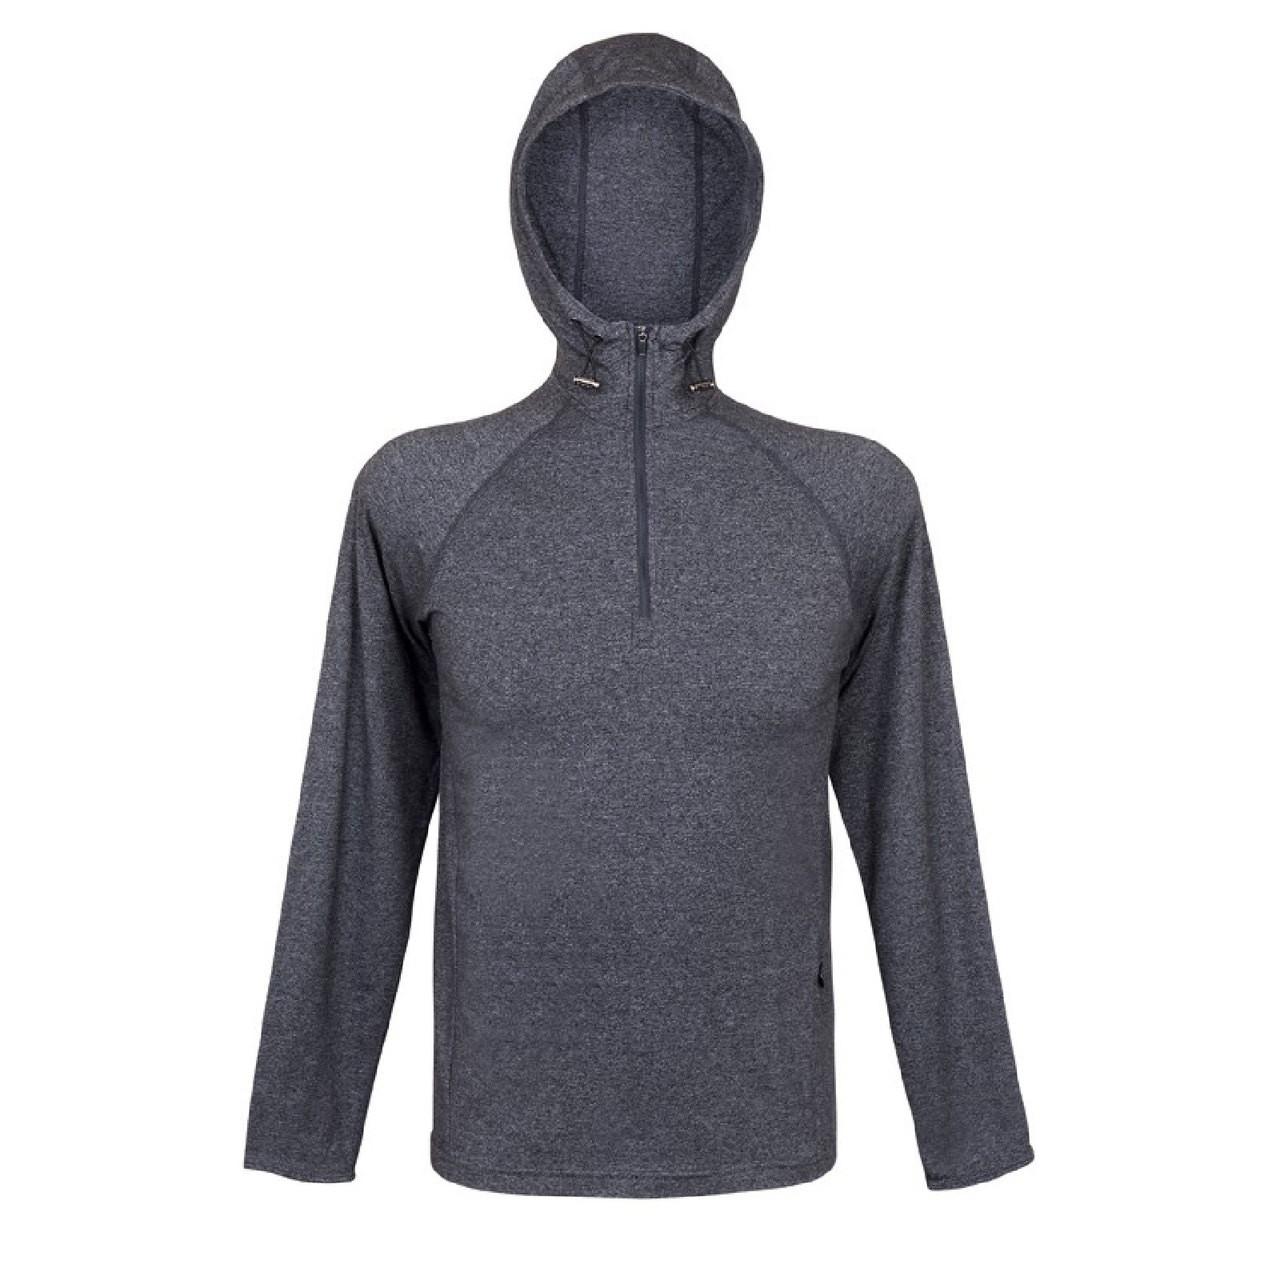 Adult Performance Hooded T-Shirt mens long sleeve tshirt plain mens hoodie